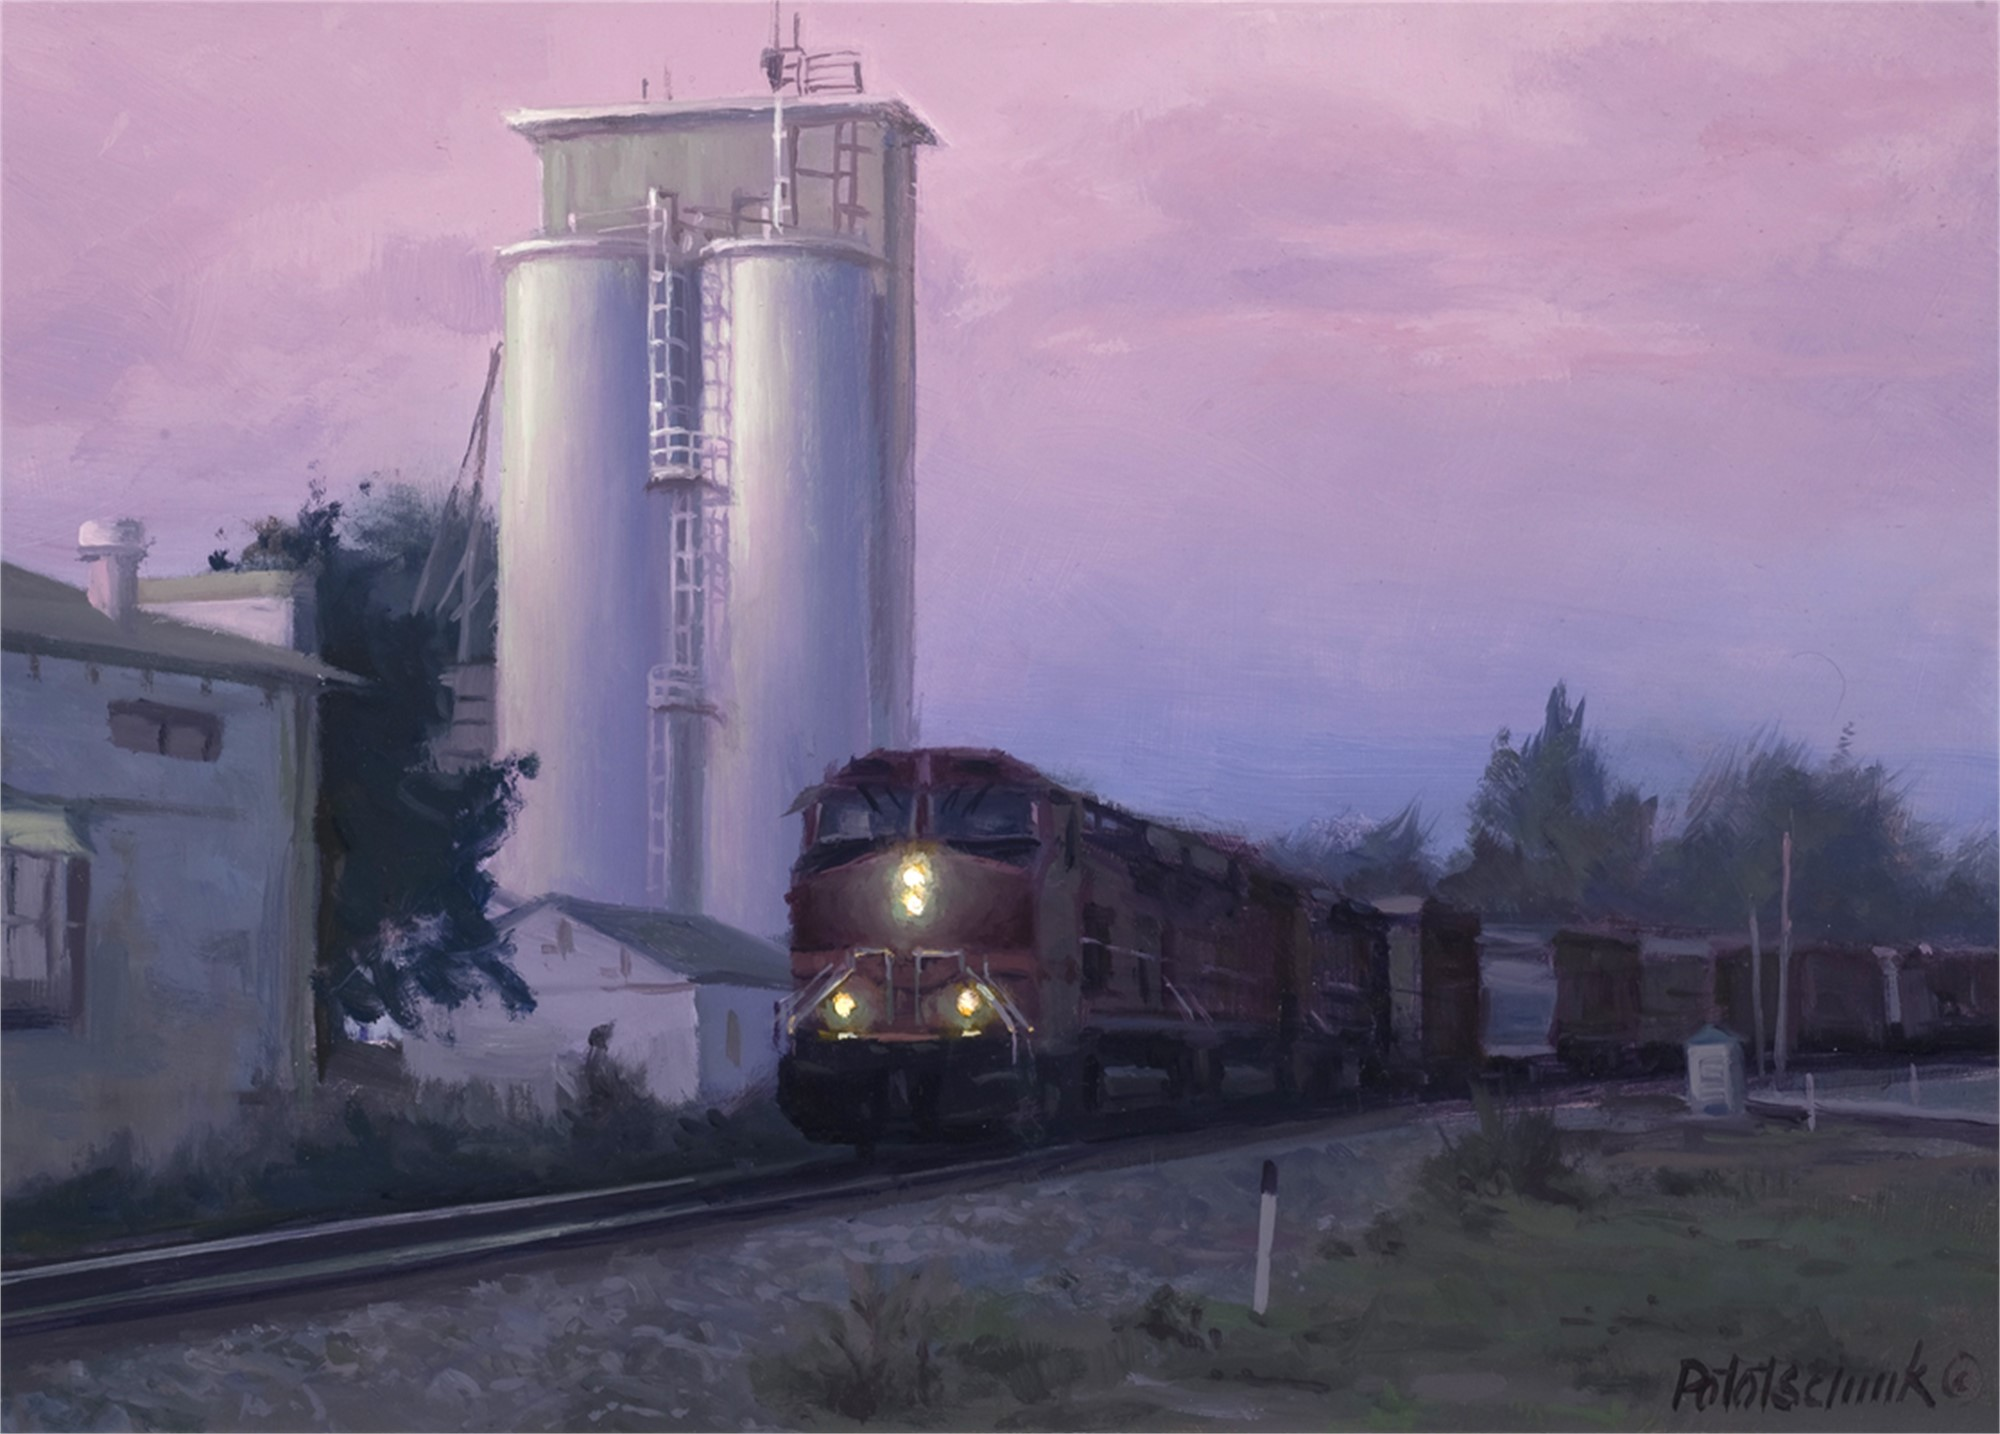 South Bound by John Pototschnik